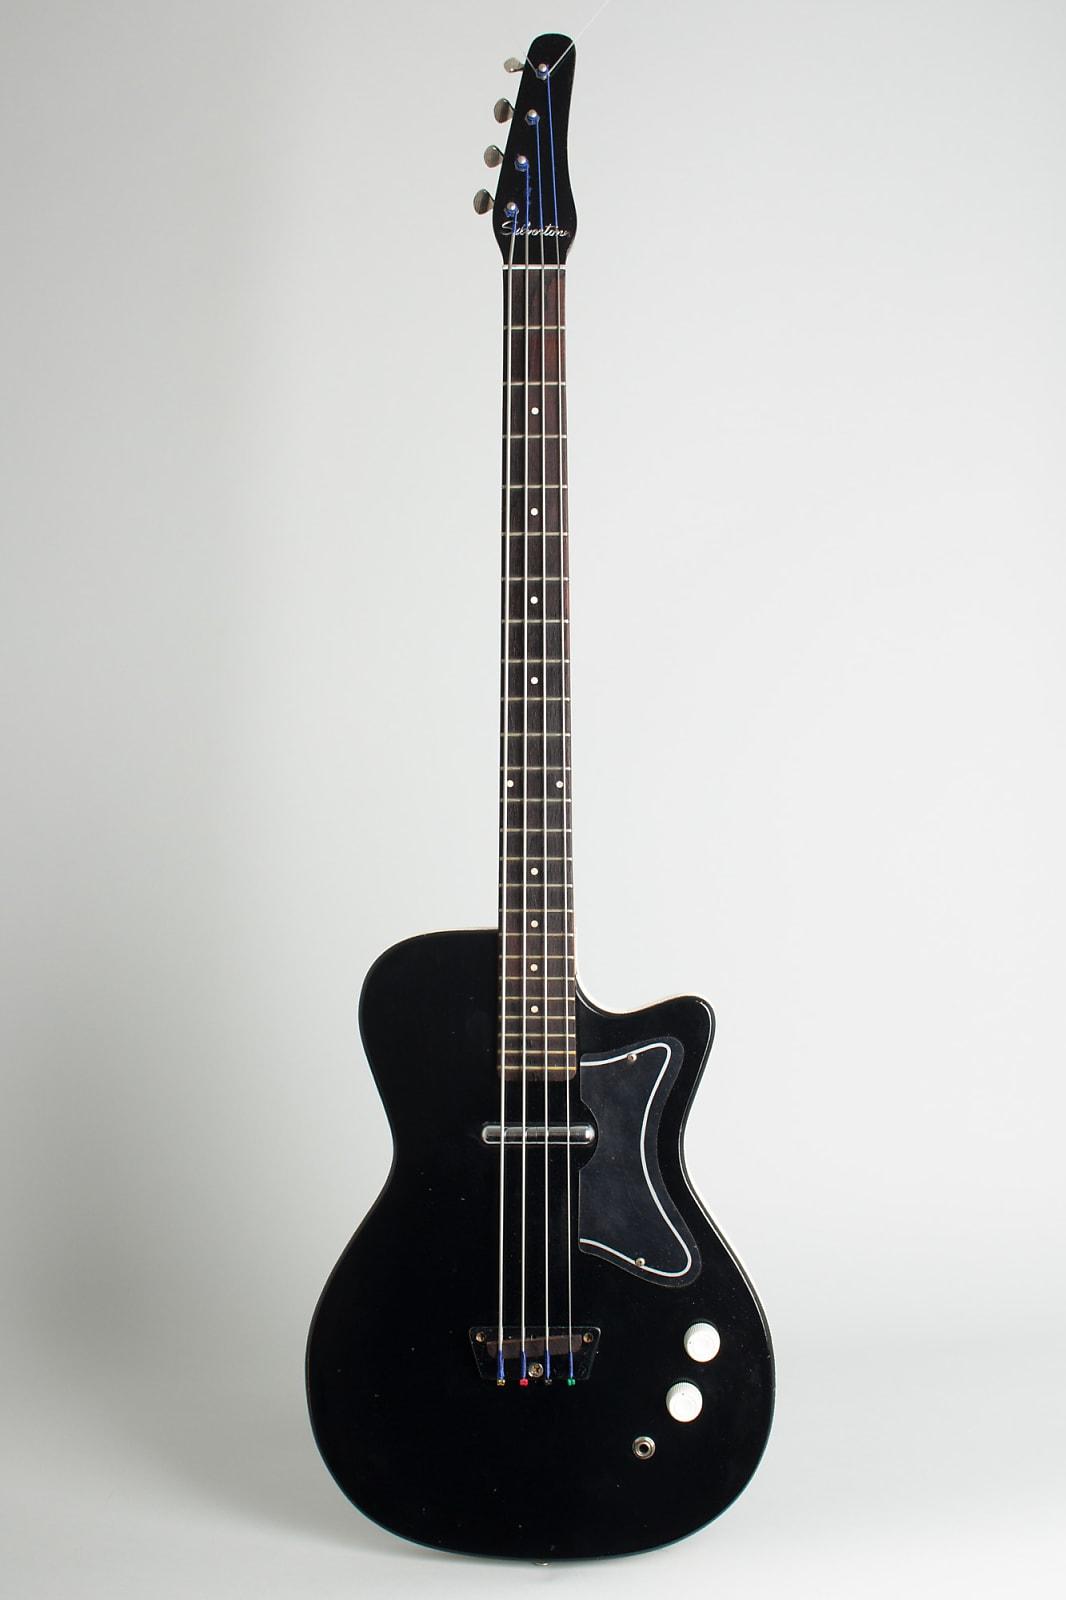 Silvertone Model 1444 Electric Bass Guitar, made by Danelectro (1965), ser. #2035, original grey hard shell case.